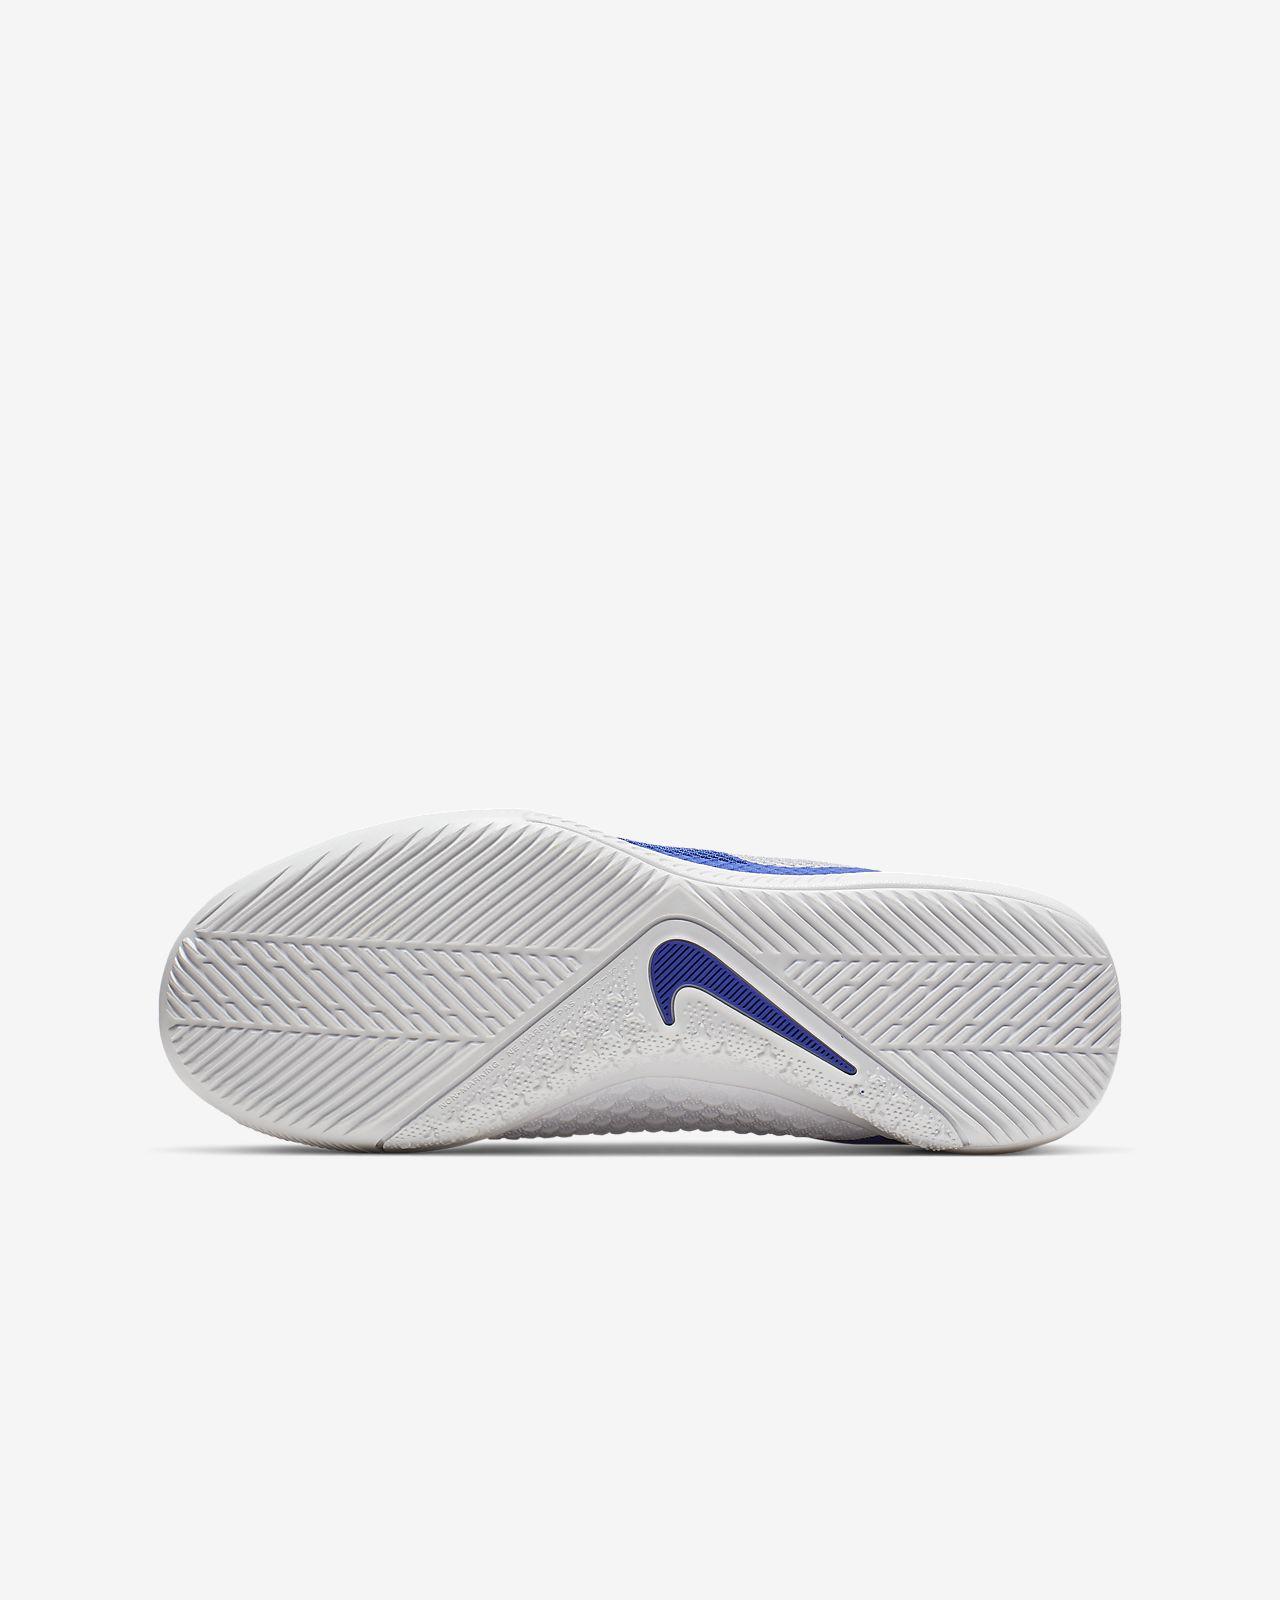 Calzado de fútbol para cancha cubierta Nike Phantom Vision Academy IC